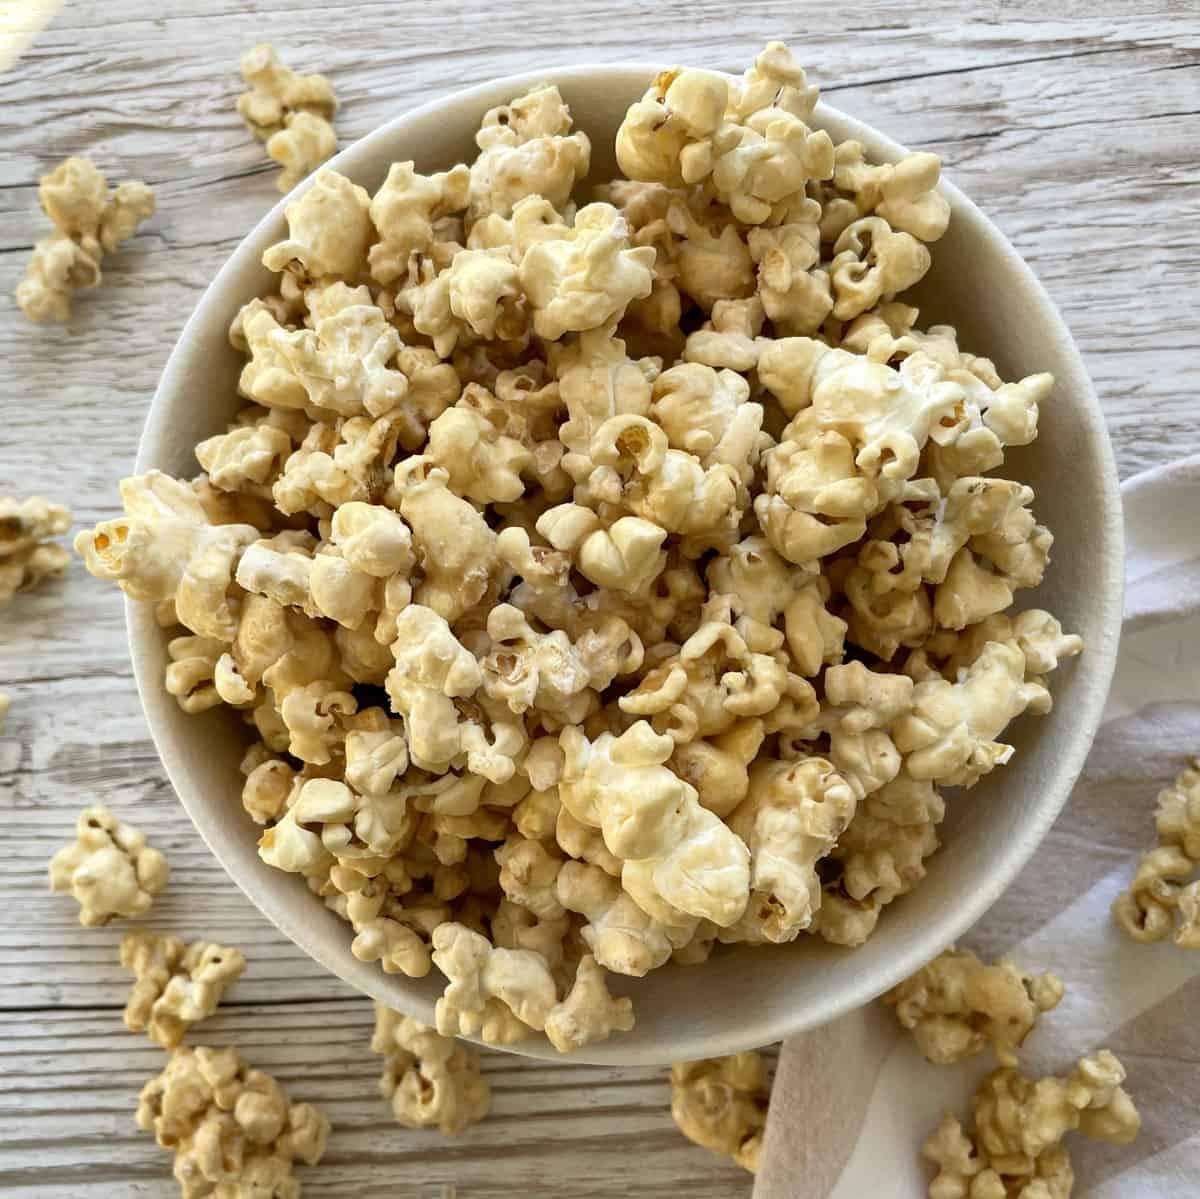 Bowl of Maple Syrup coated popcorn